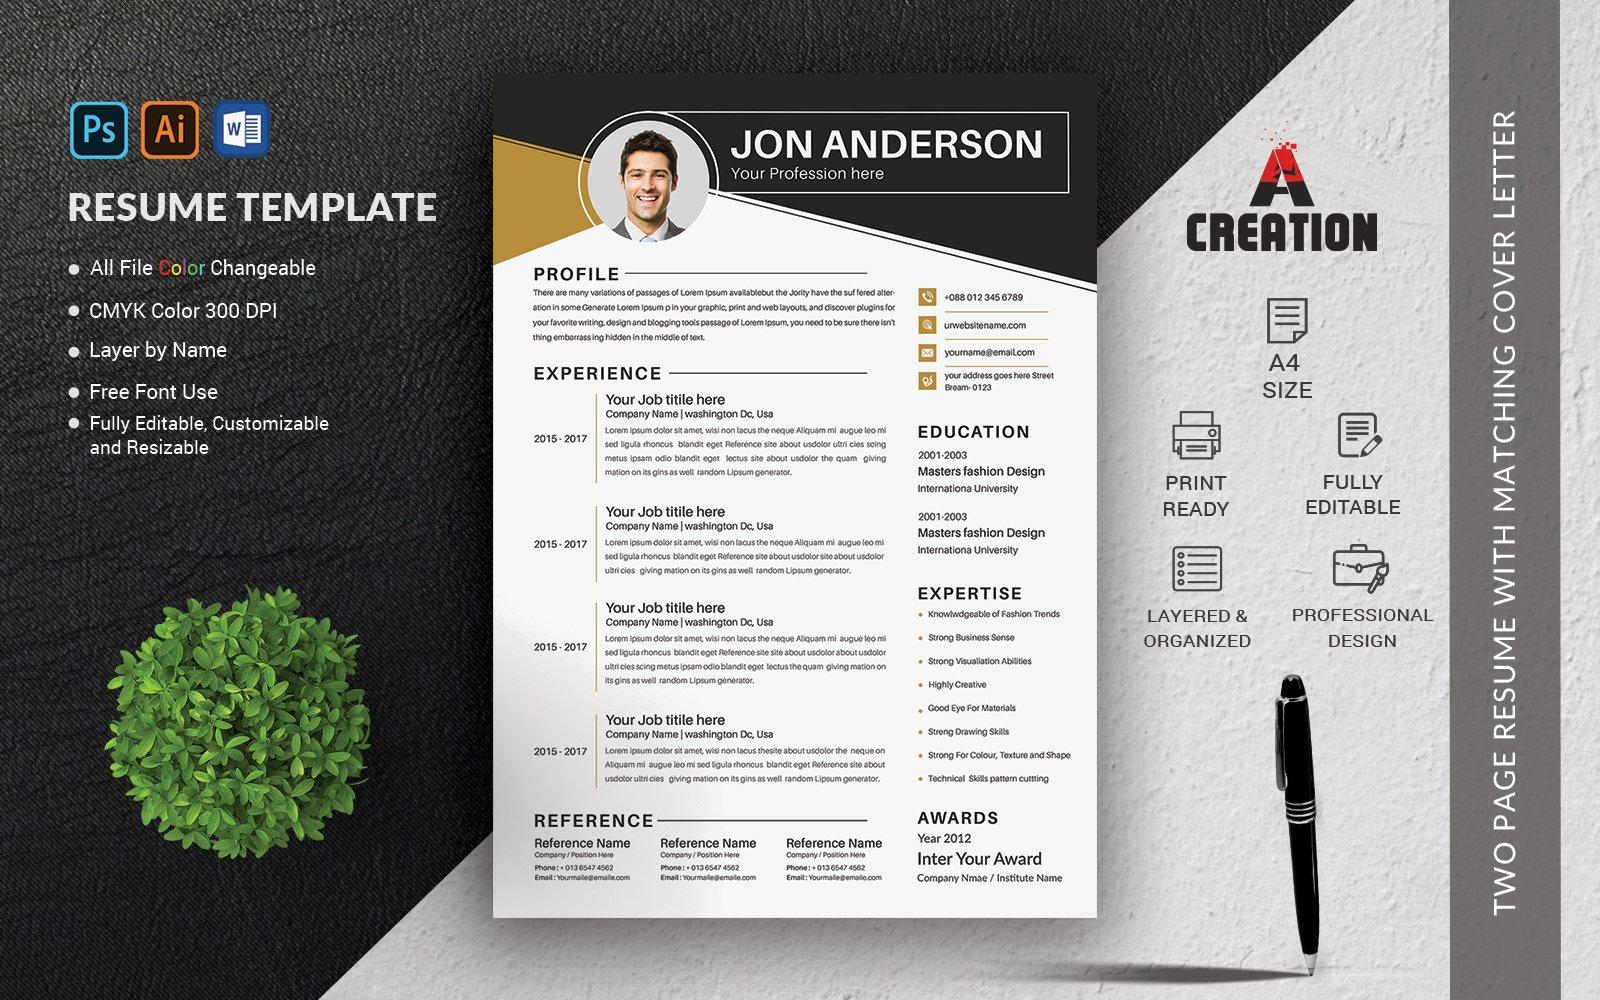 Jon Anderson Fully Editable Resume Template